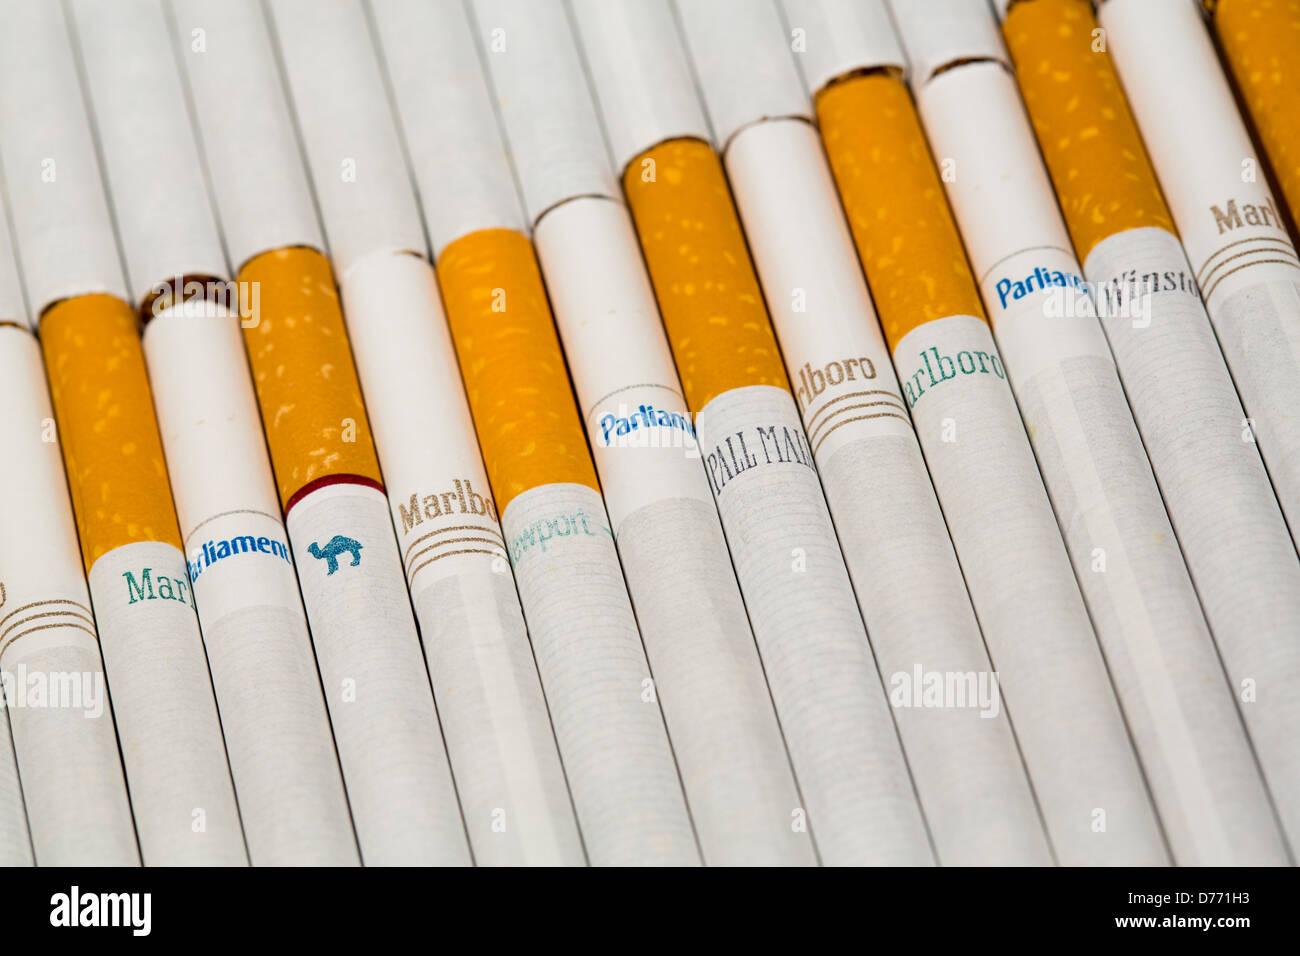 Old buy cigarettes Gauloises Australia